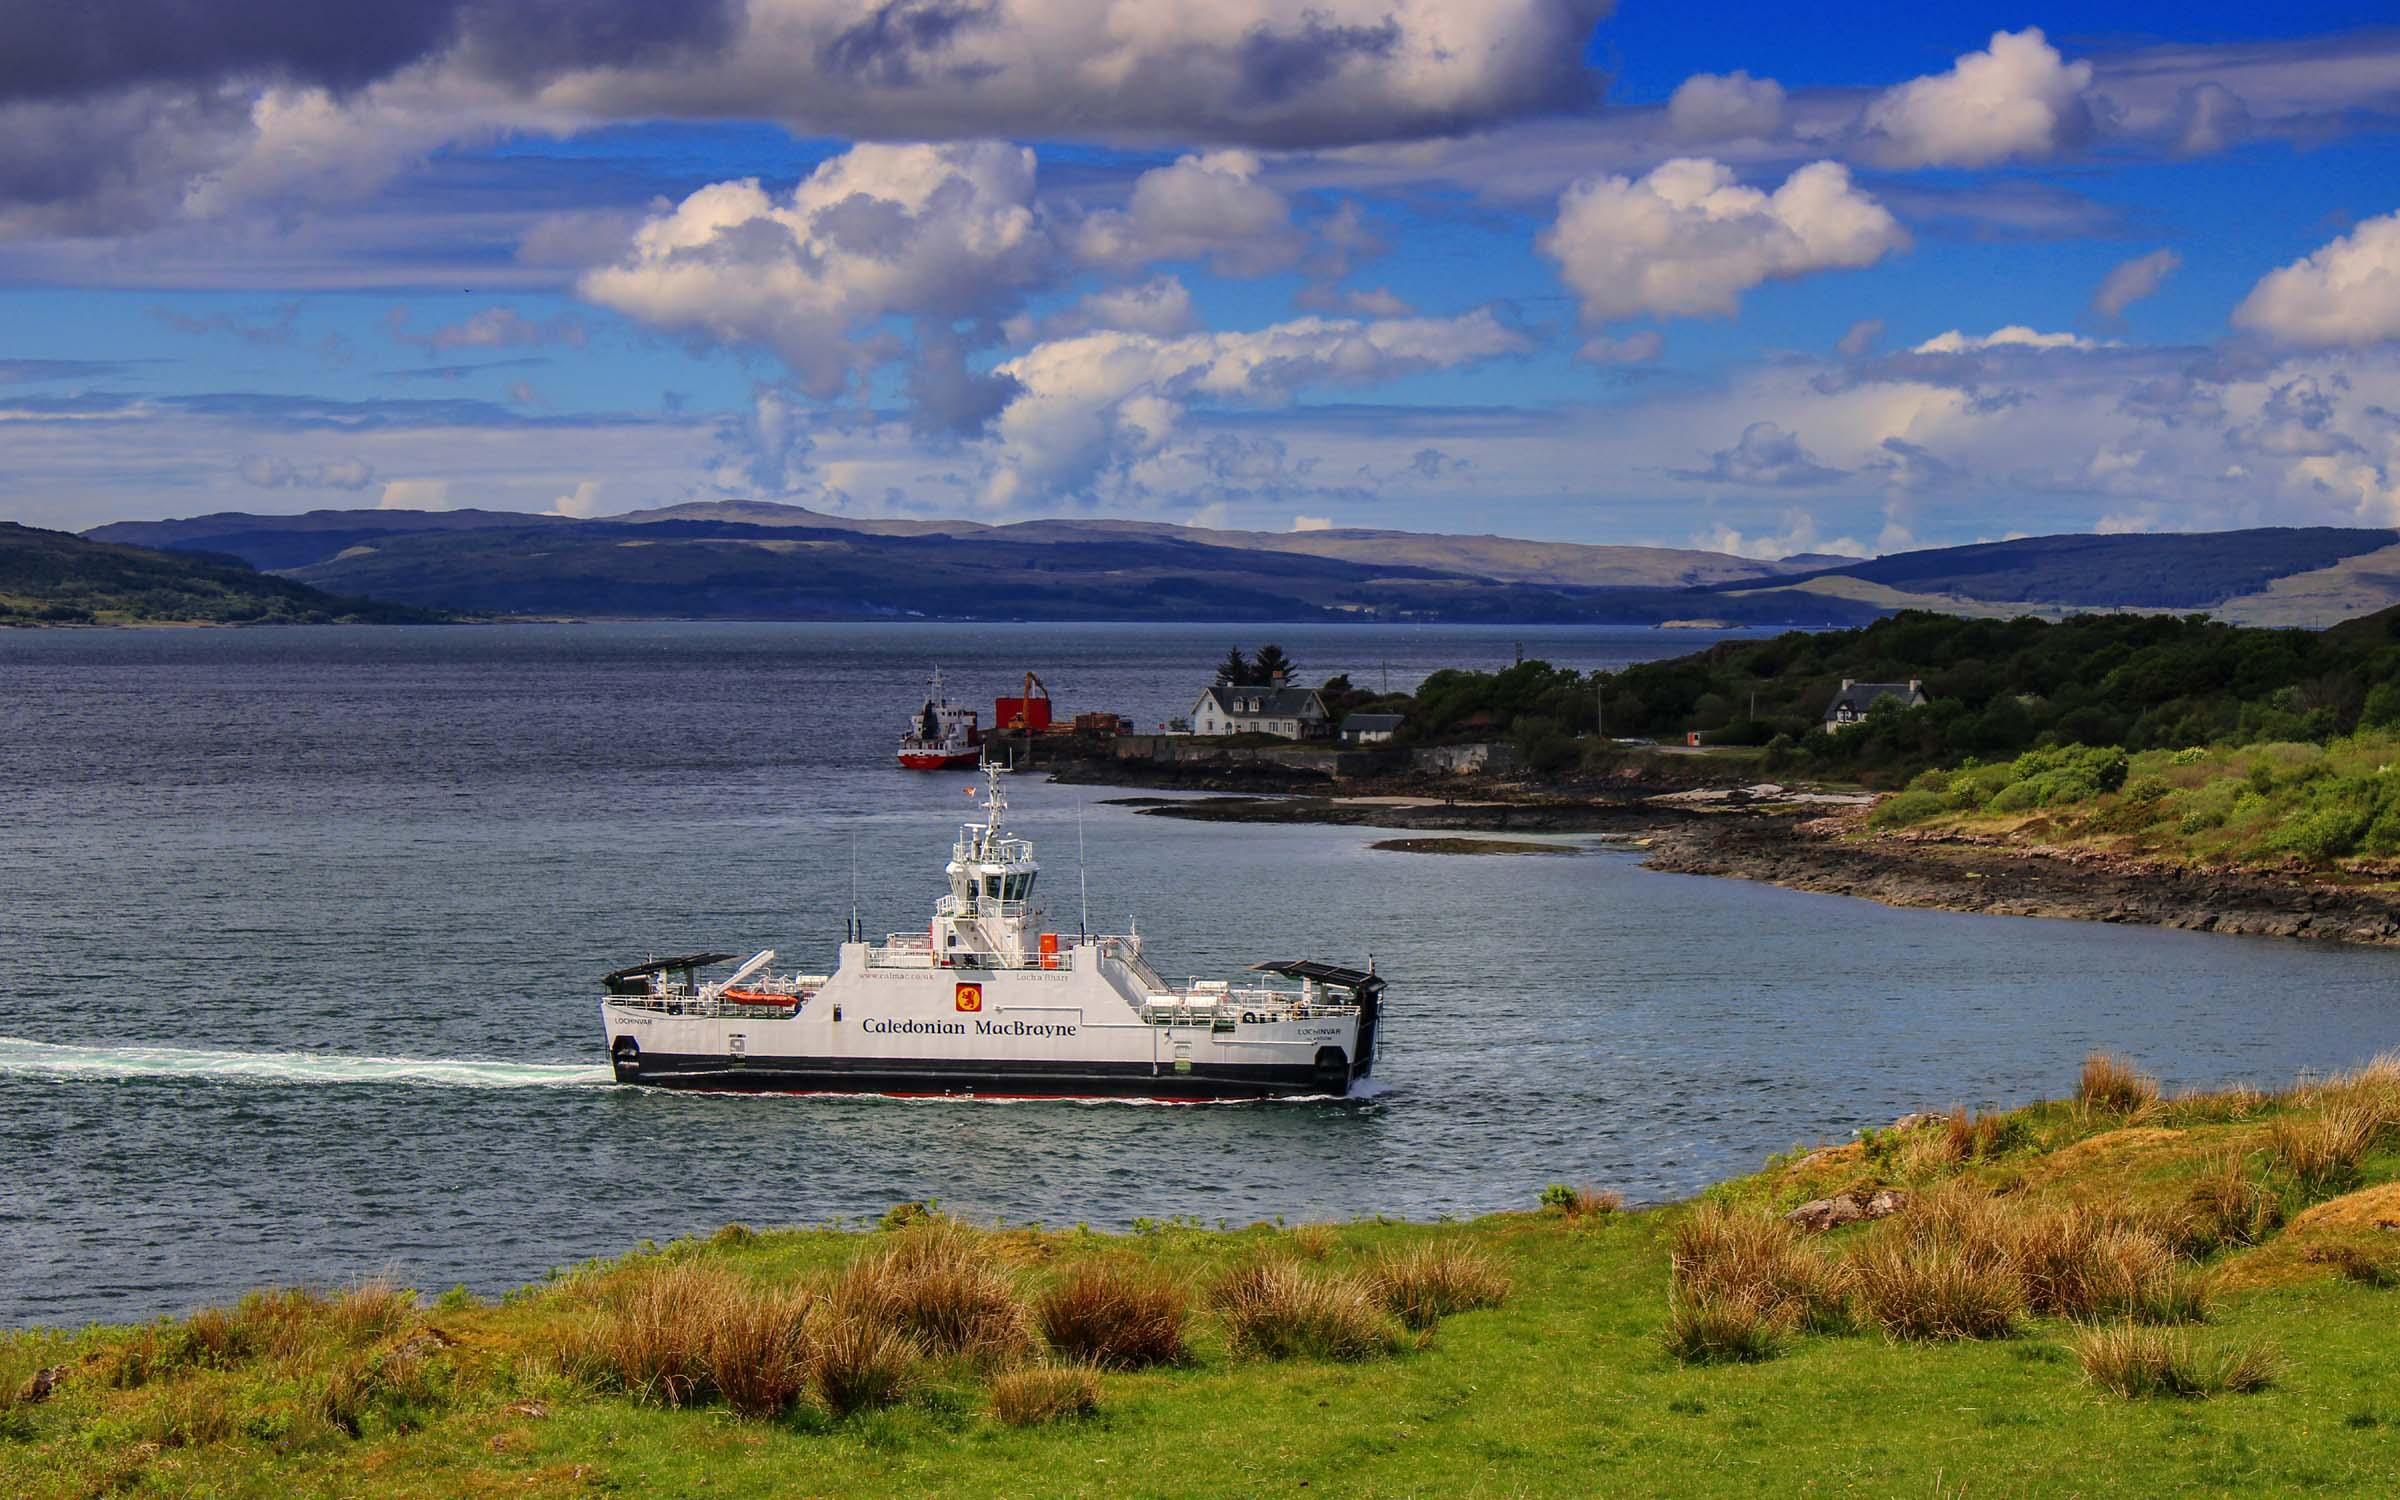 Lochinvar crossing to Lochaline (Ships of CalMac)